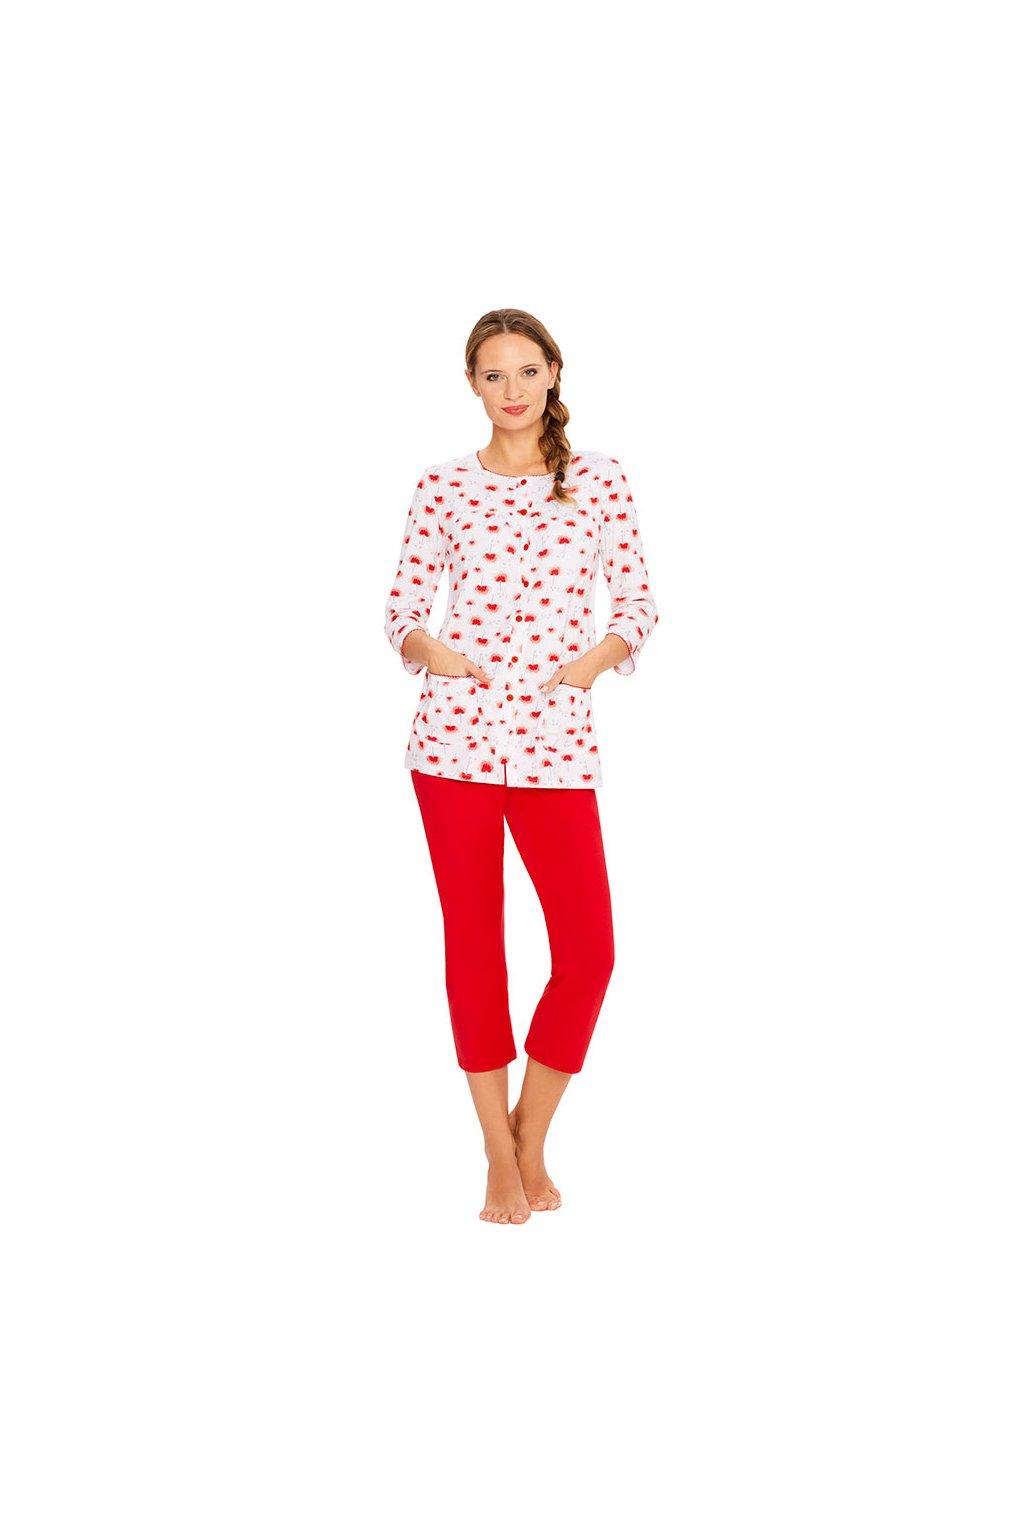 Dámské pyžamo s 3/4 rukávem, 104323 894, bílá